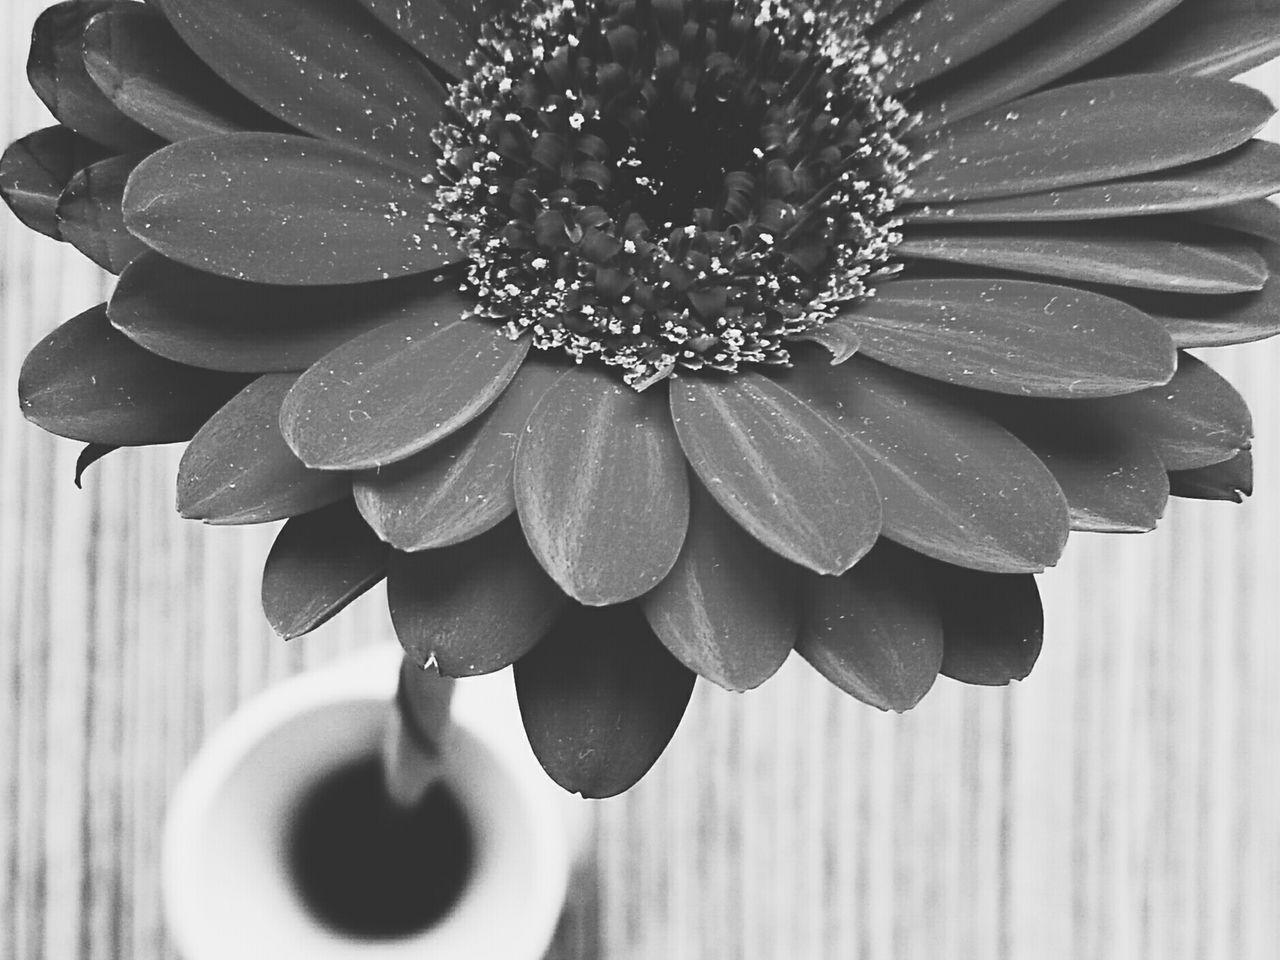 Flower Flower Head Beauty In Nature VSCO Taking Photos Vscocam Still Life Eye4photography  Mobilephotography HuaweiP9 Black&white Blackandwhite Blacknwhite Black & White Flowerporn Close-up Black And White Nature